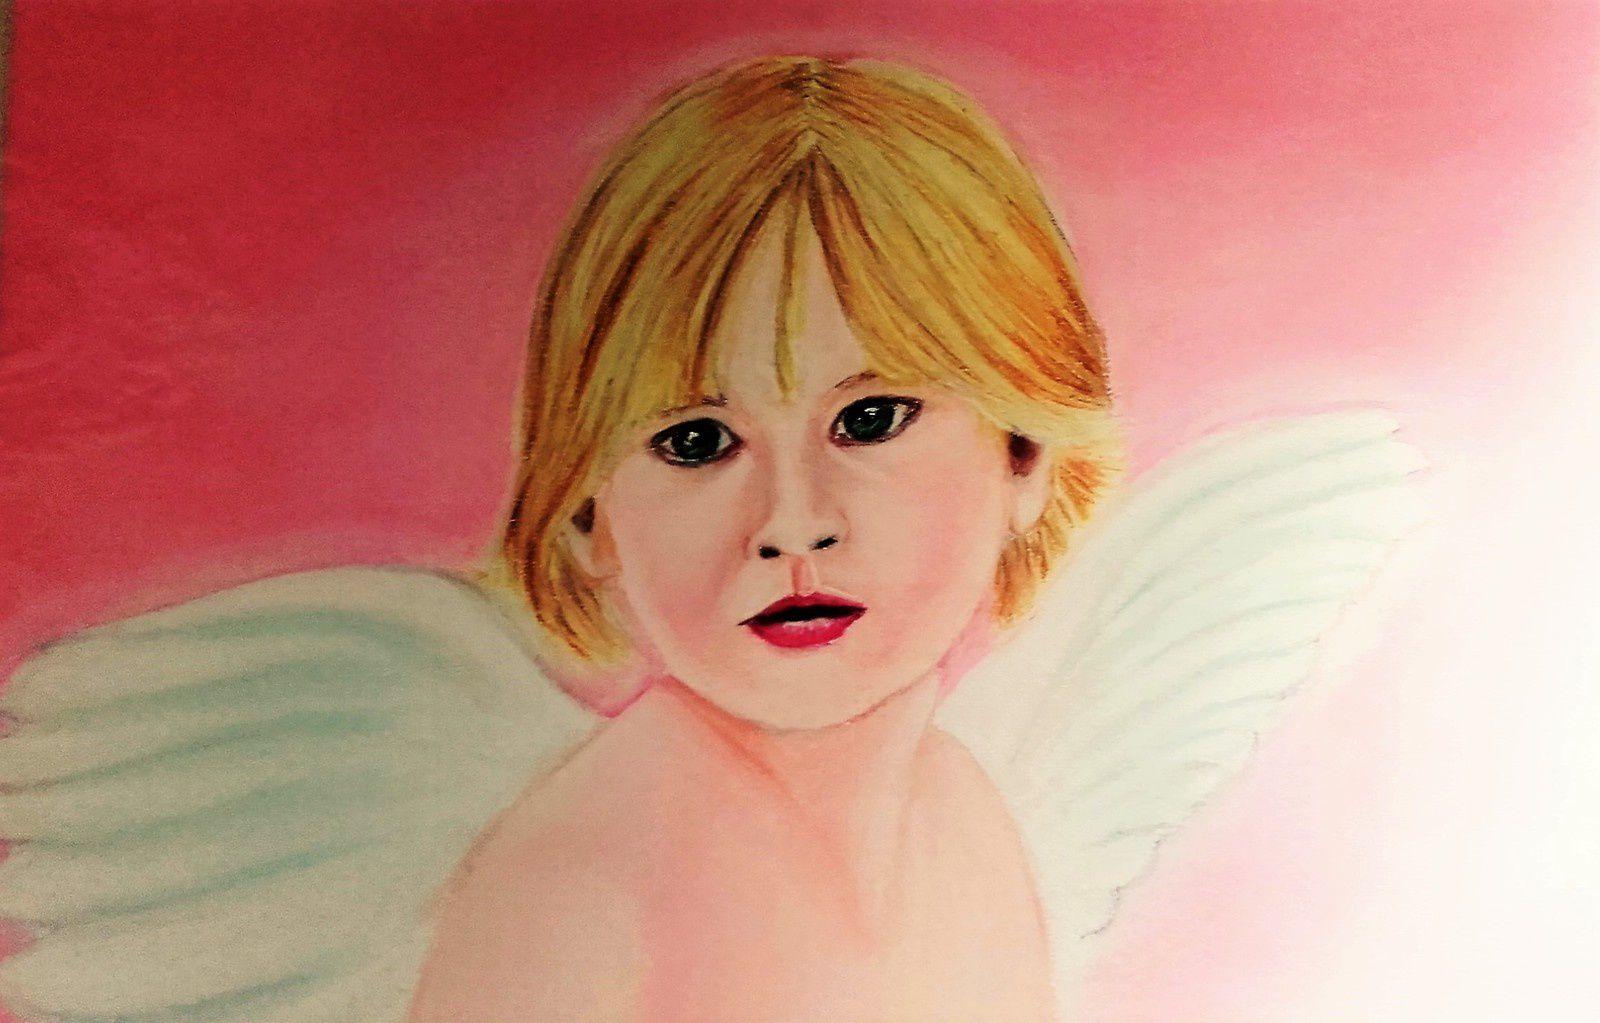 L'ange...